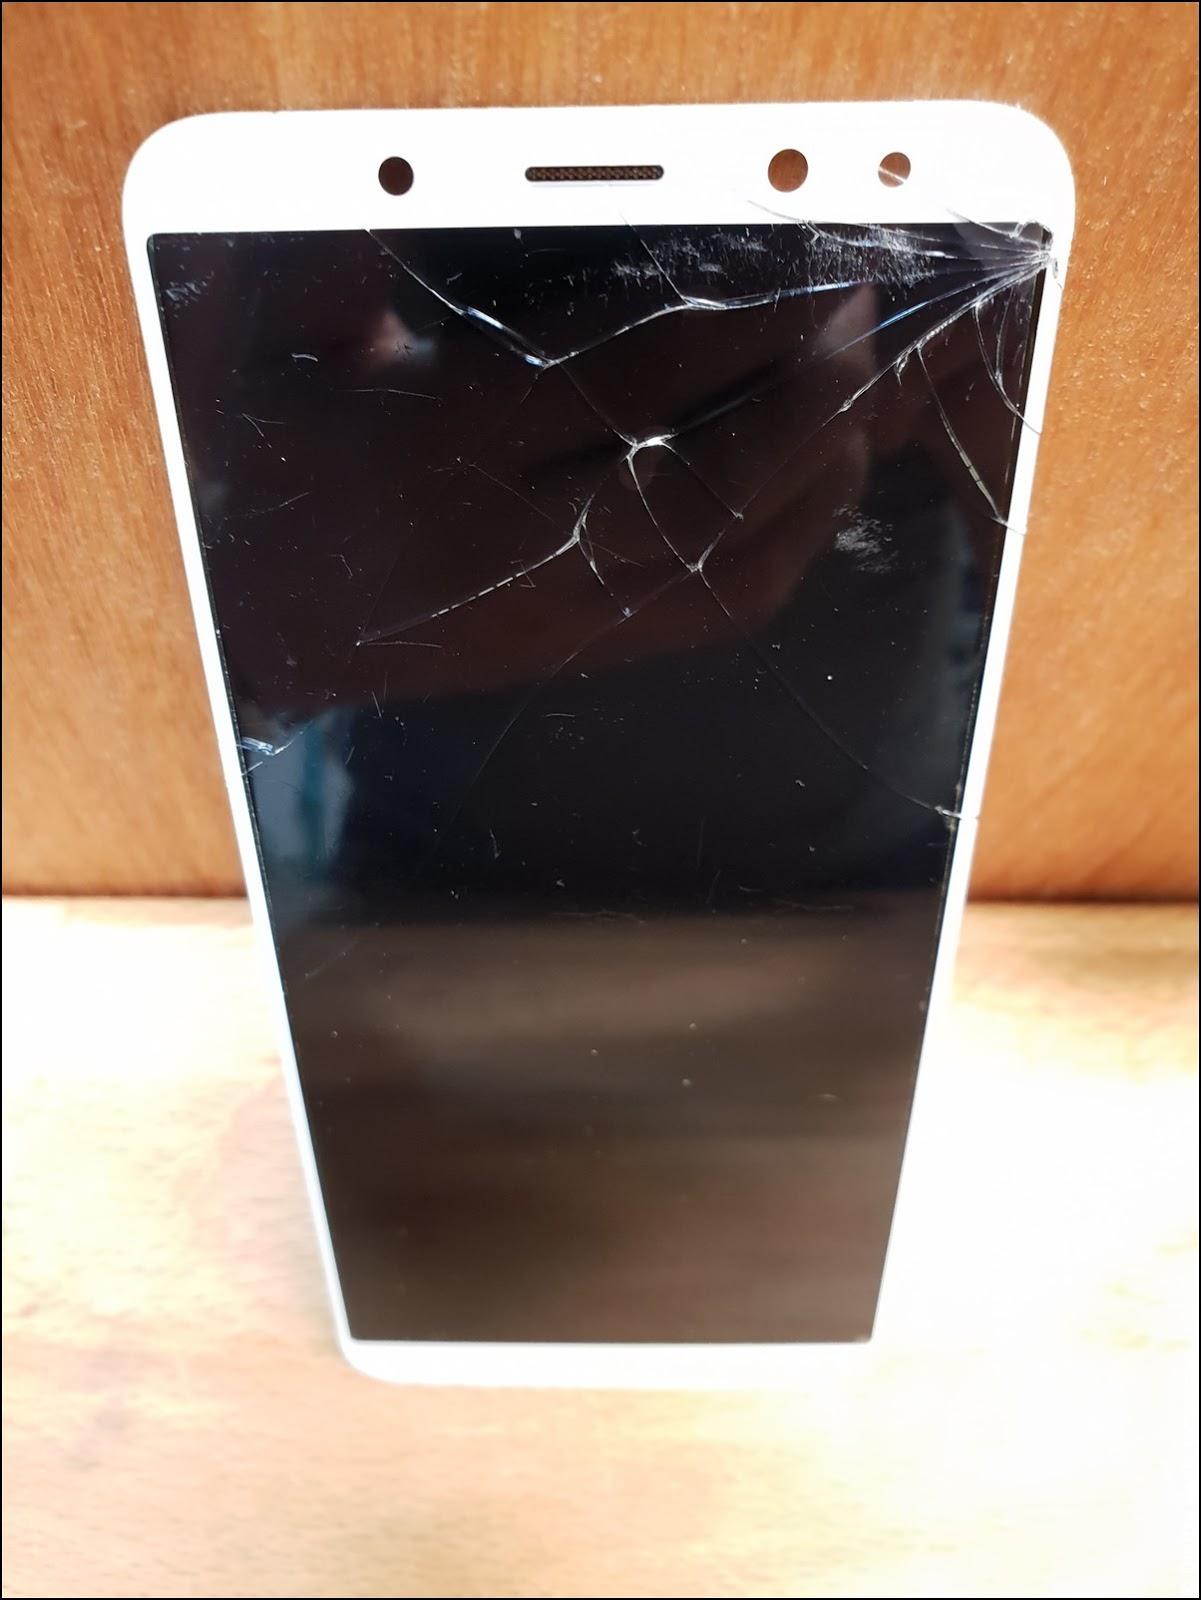 Пациент: Huawei Mate 10 Lite.